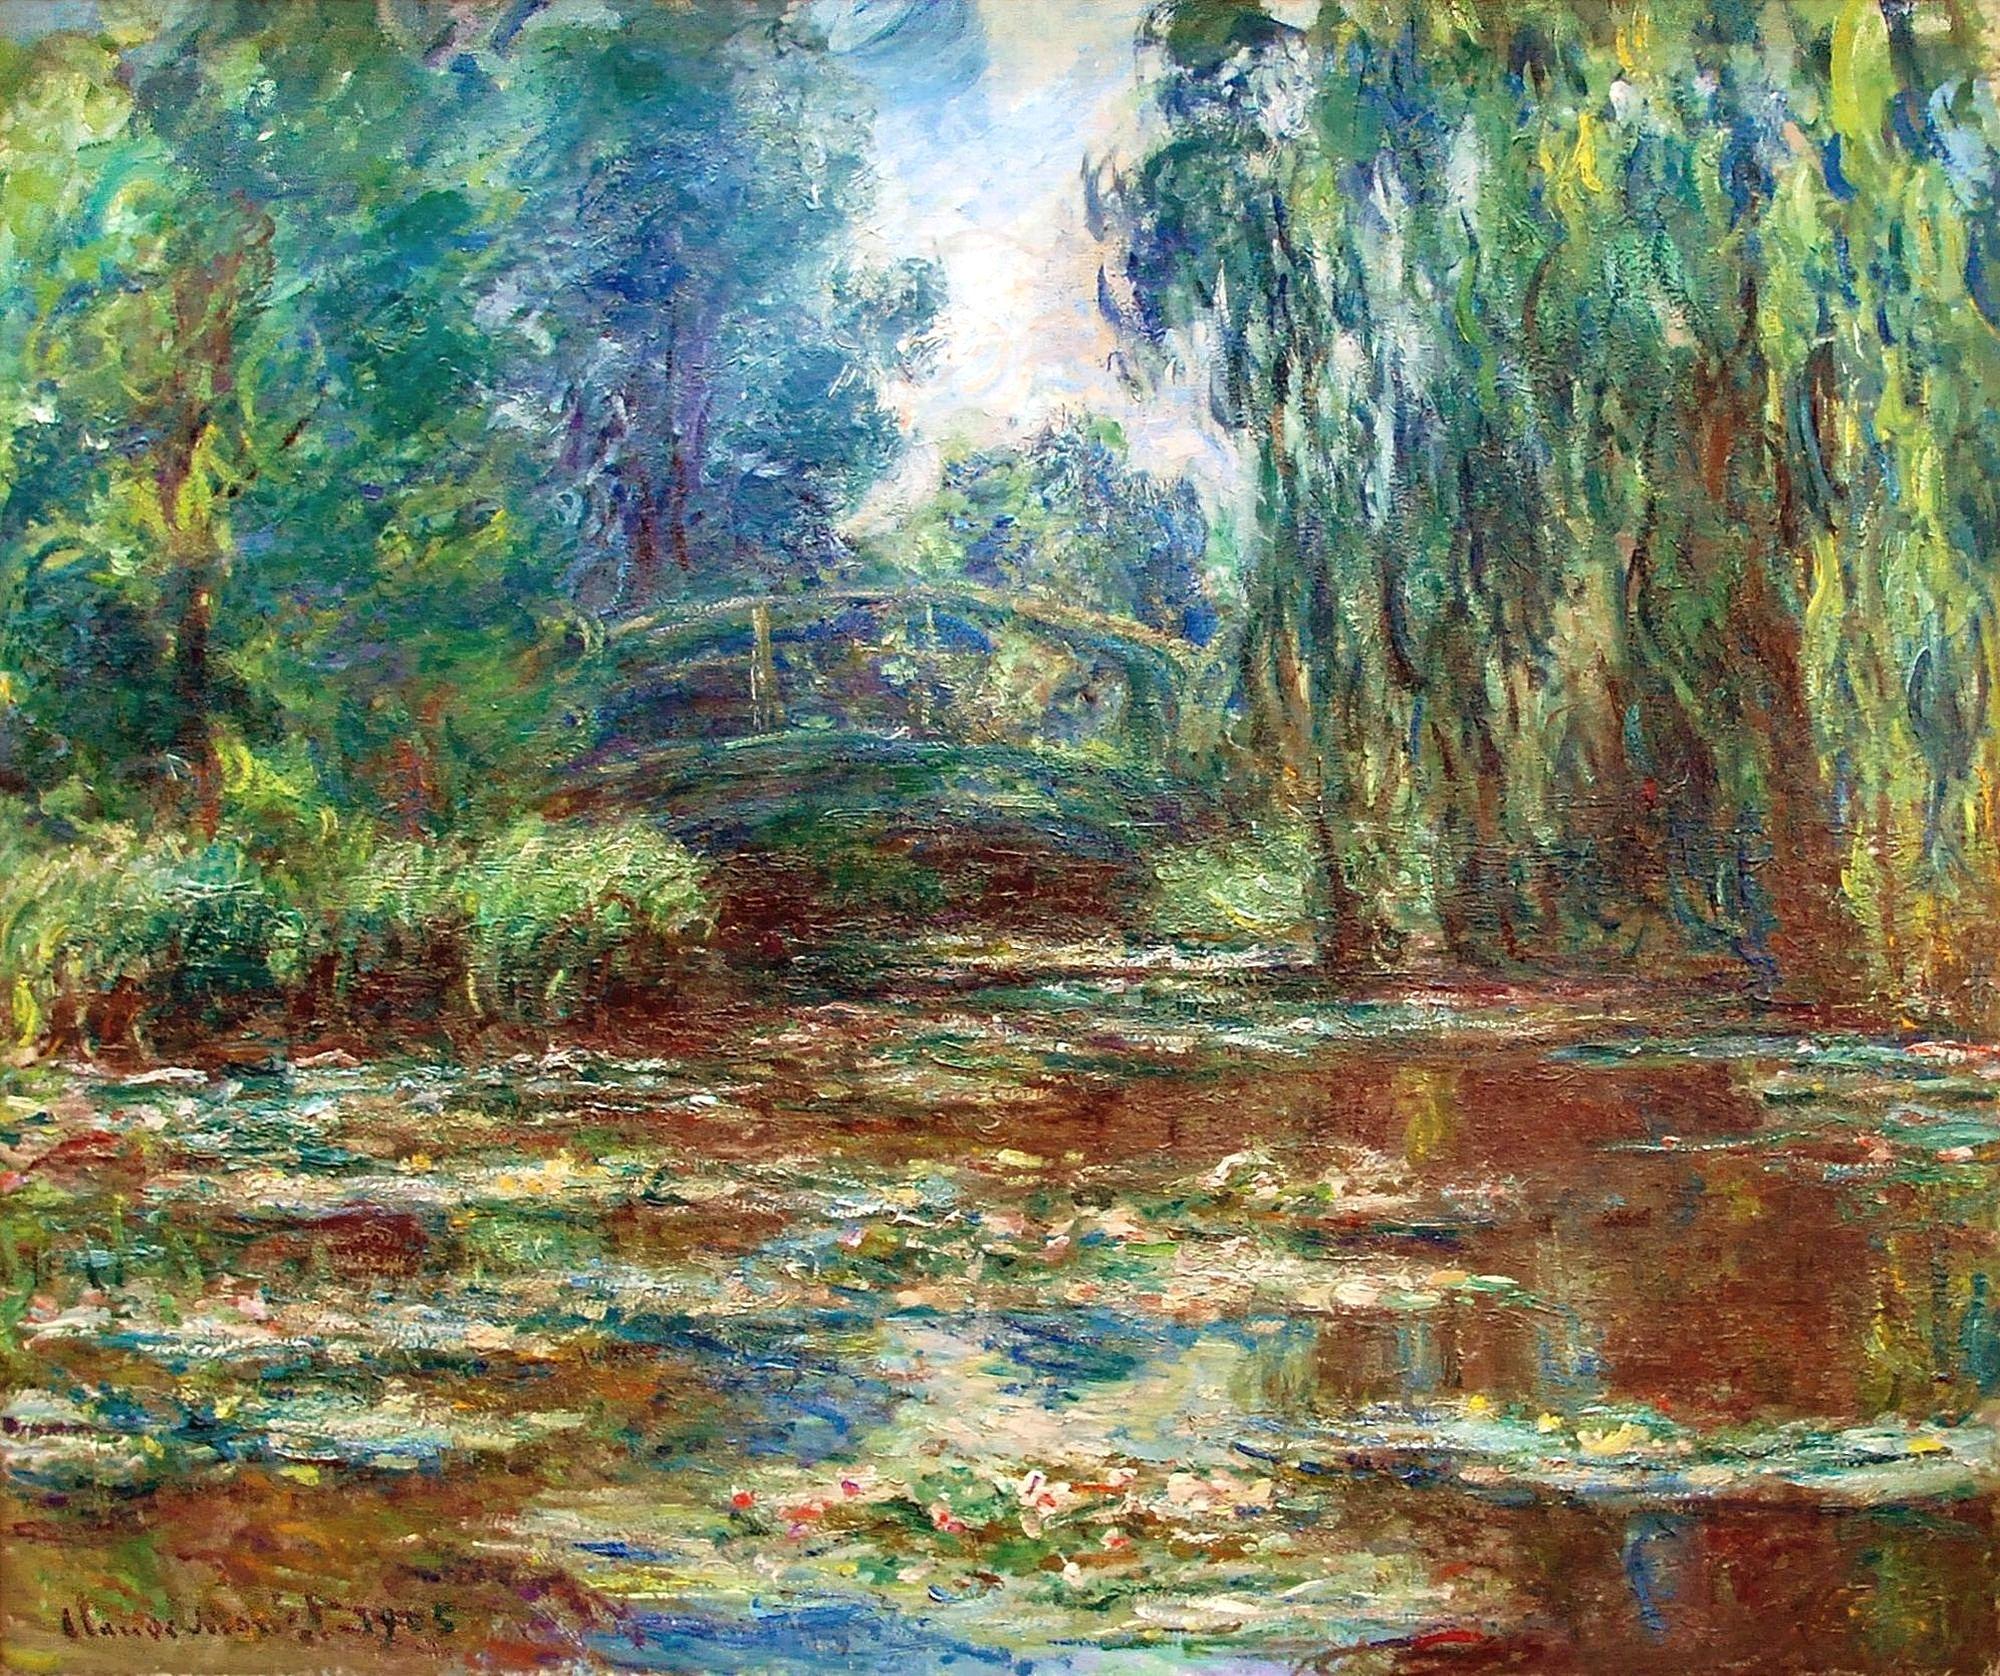 Water Lily Pond and Bridge - Claude Monet | Monet ...